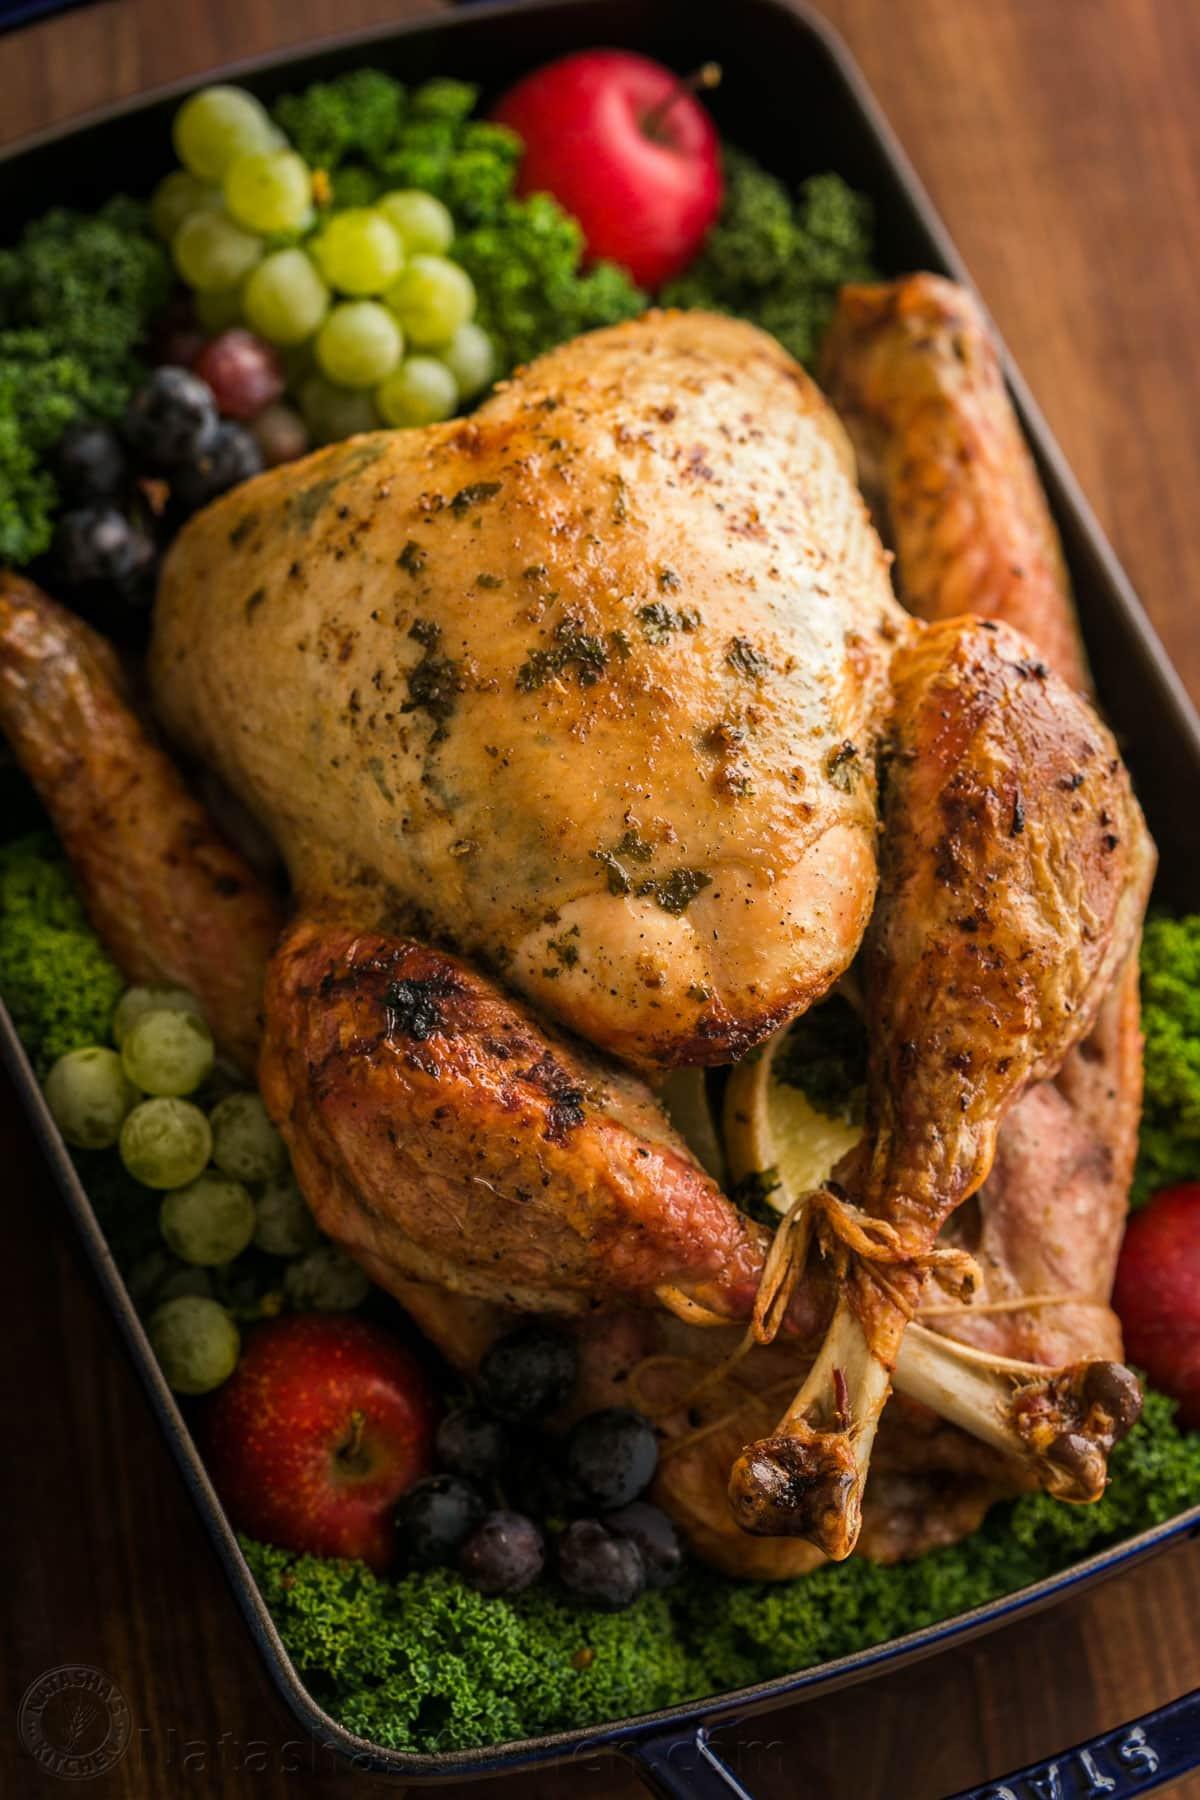 Baked Turkey Recipes For Thanksgiving  Thanksgiving Turkey Recipe VIDEO NatashasKitchen